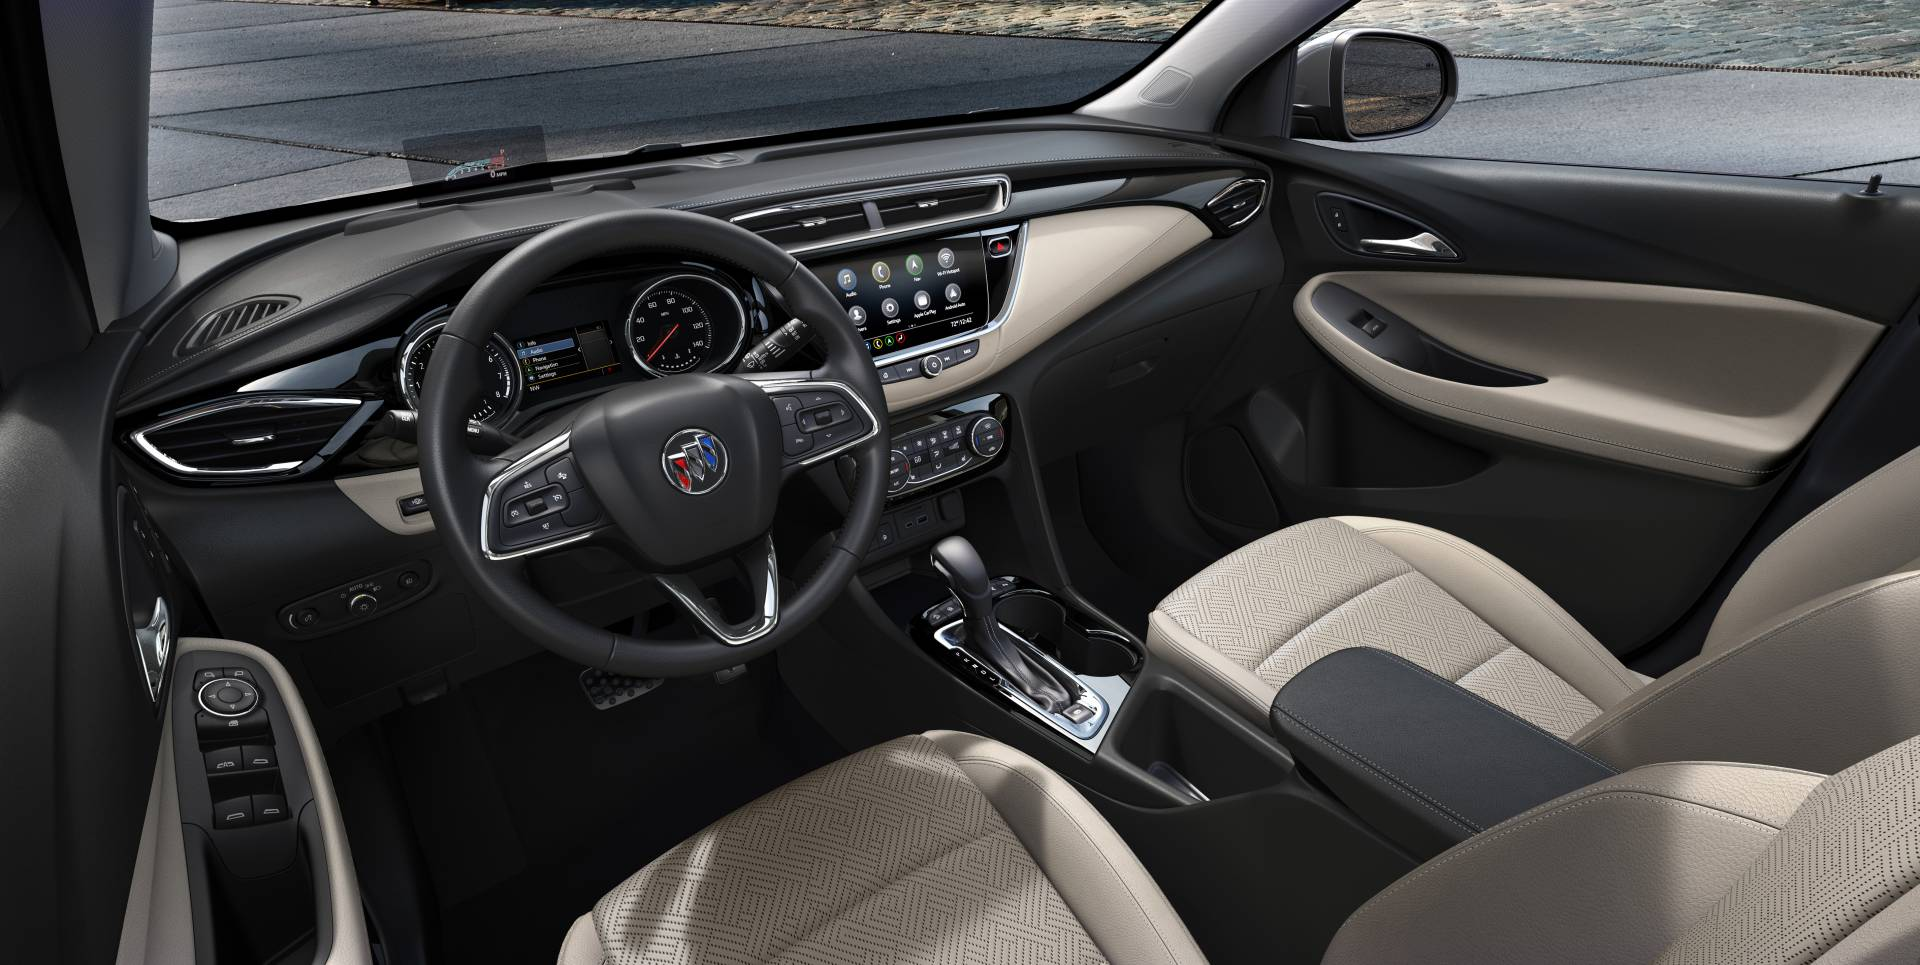 2020 Buick Encore GX Fuel Economy Tops 31 MPG Combined ...